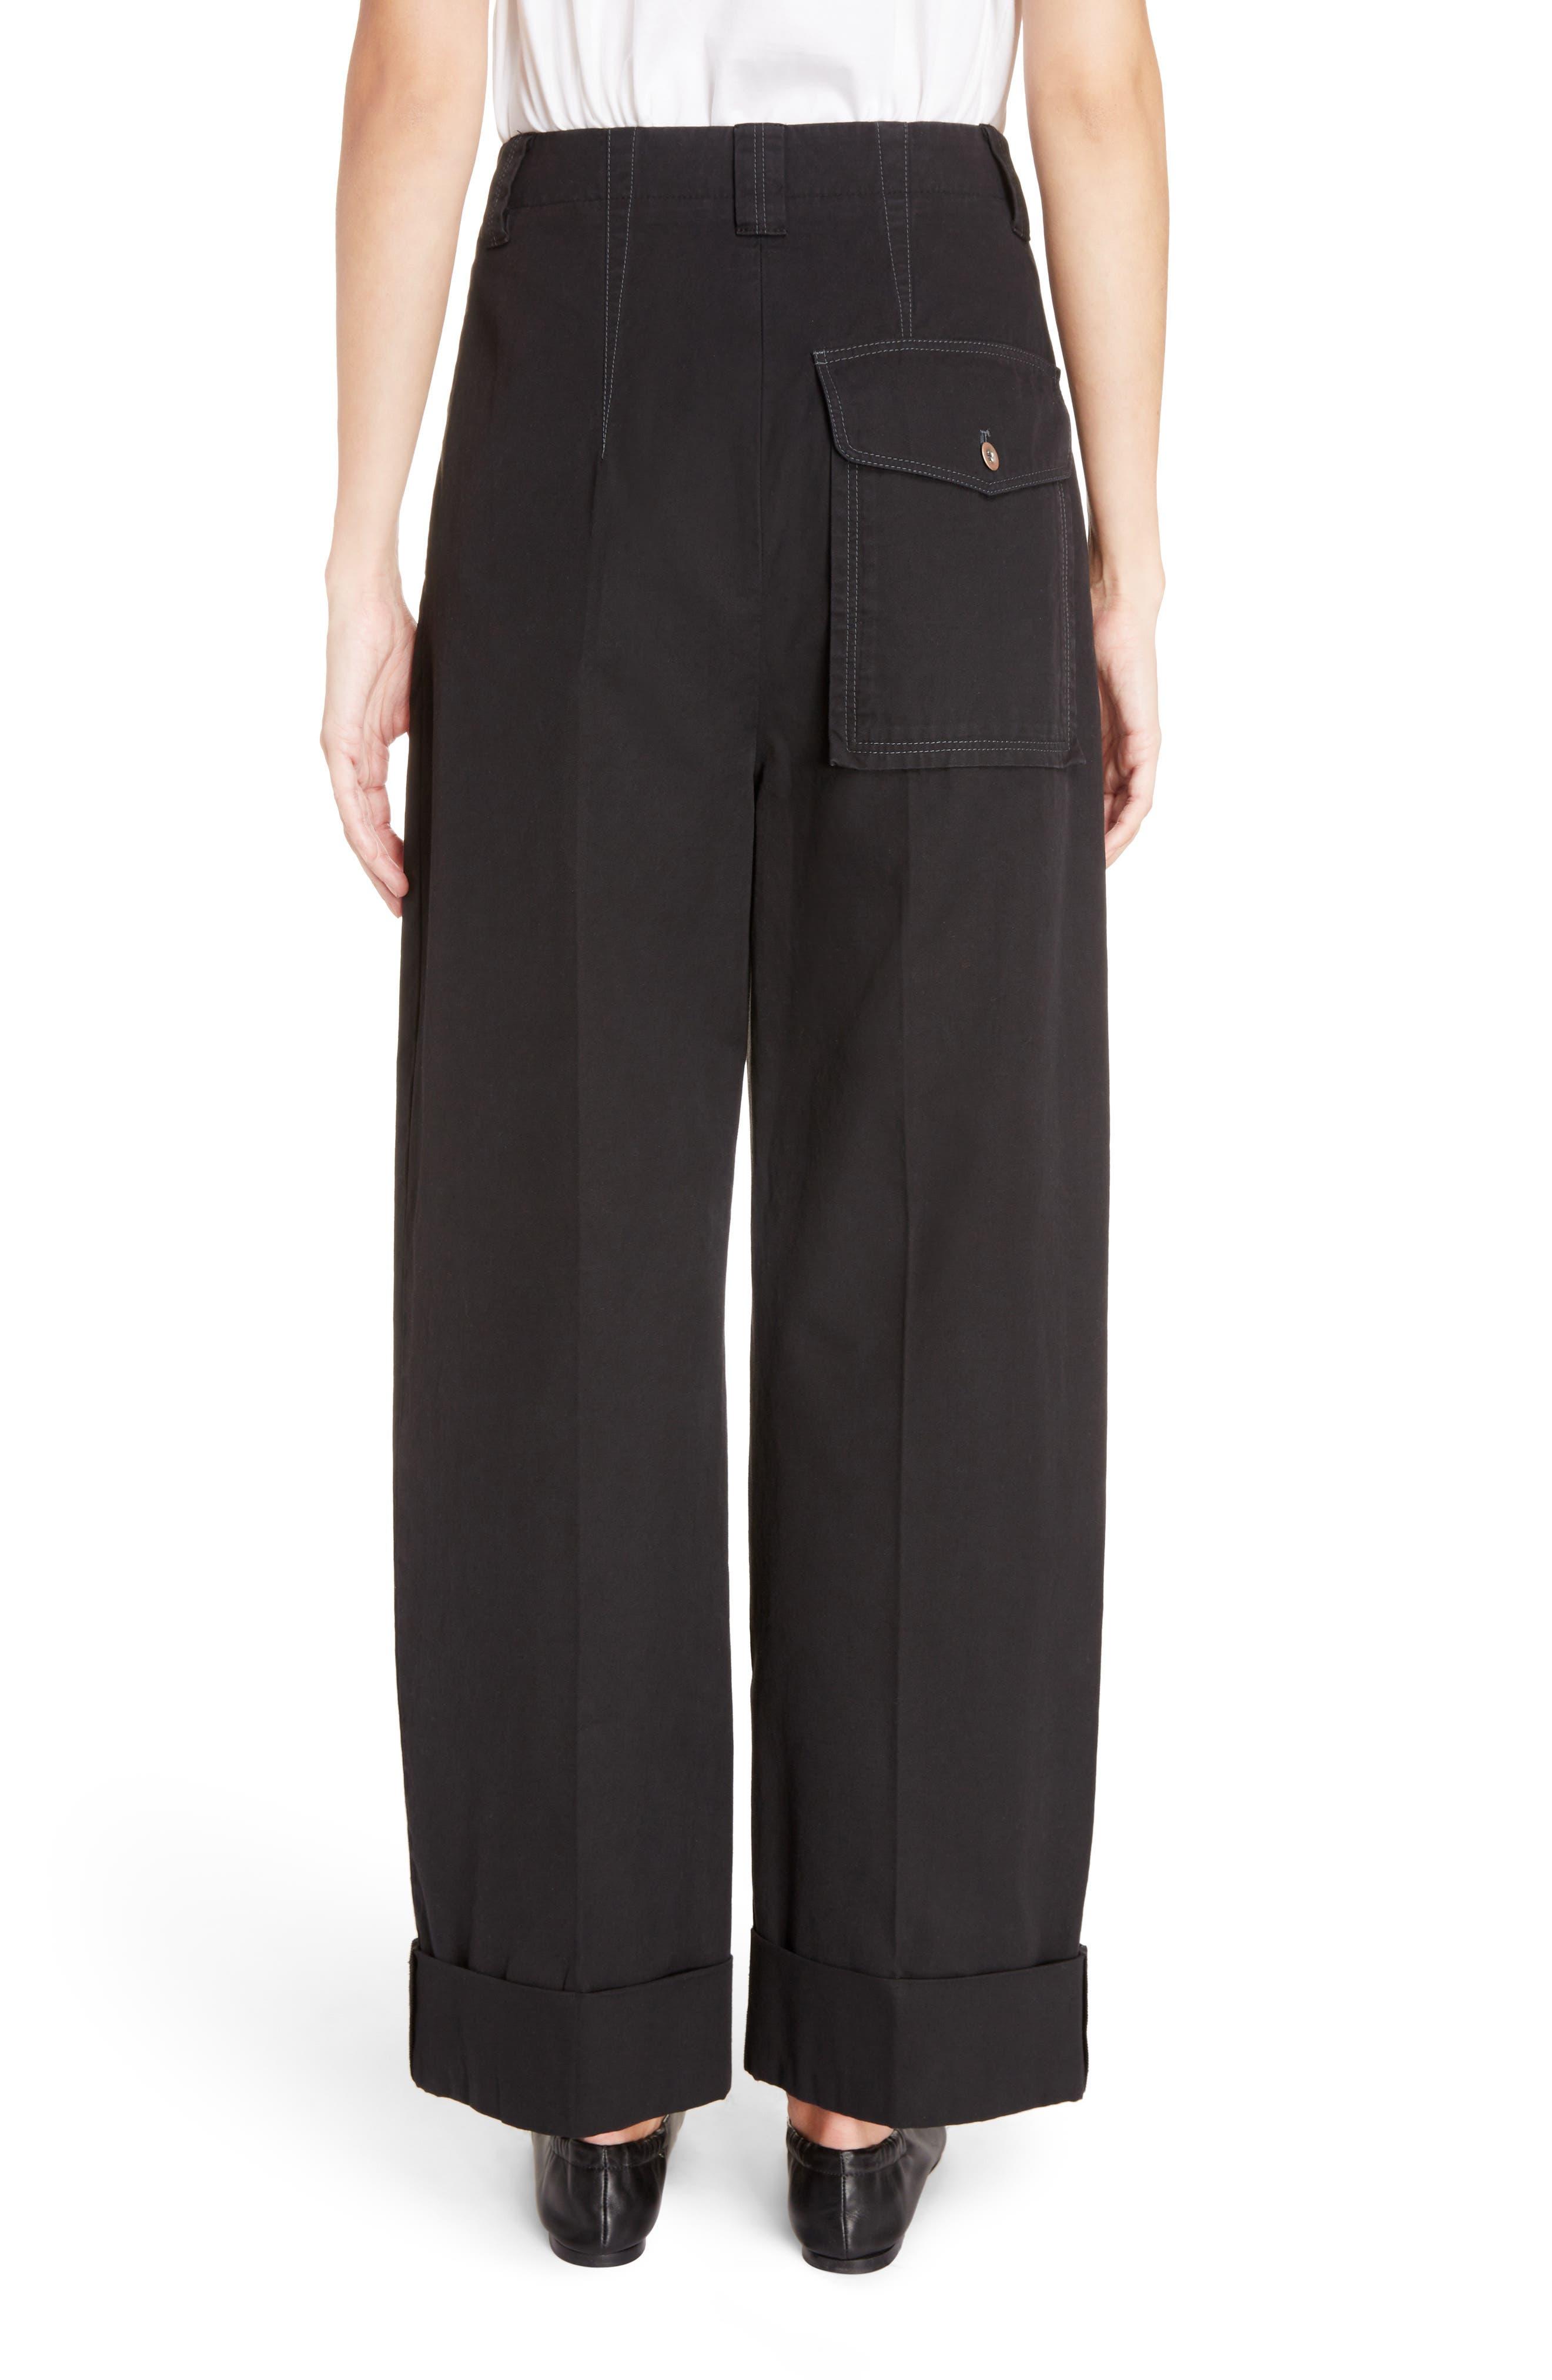 Madya Cuffed Cotton Pants,                             Alternate thumbnail 6, color,                             Black